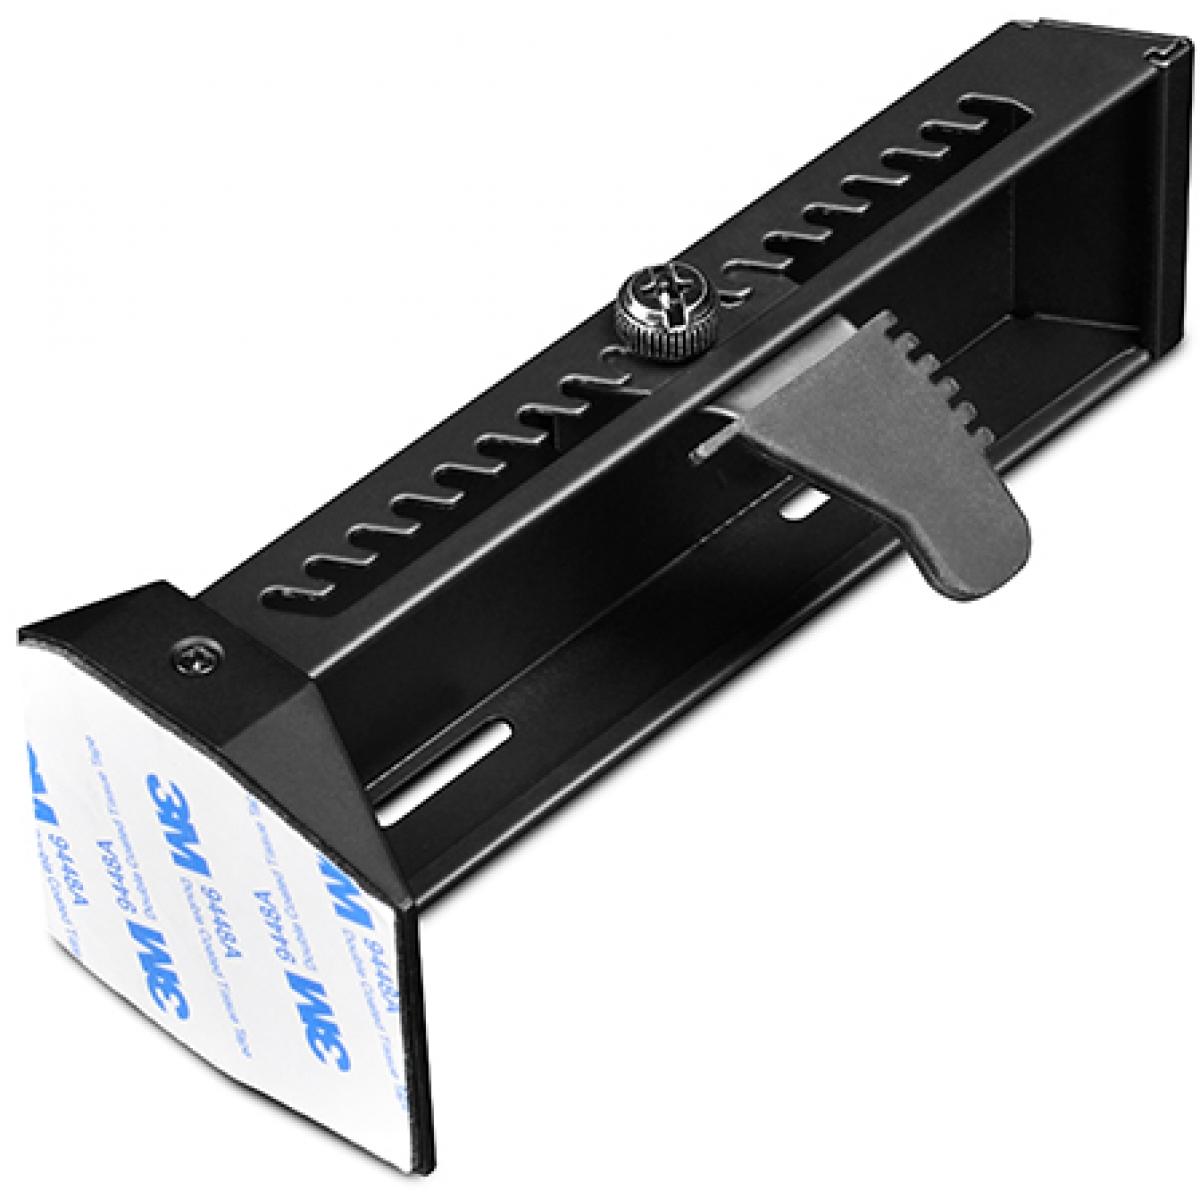 Suporte de Placa de Vídeo, Deepcool GH-01, Preto, DP-GCH2-GH01